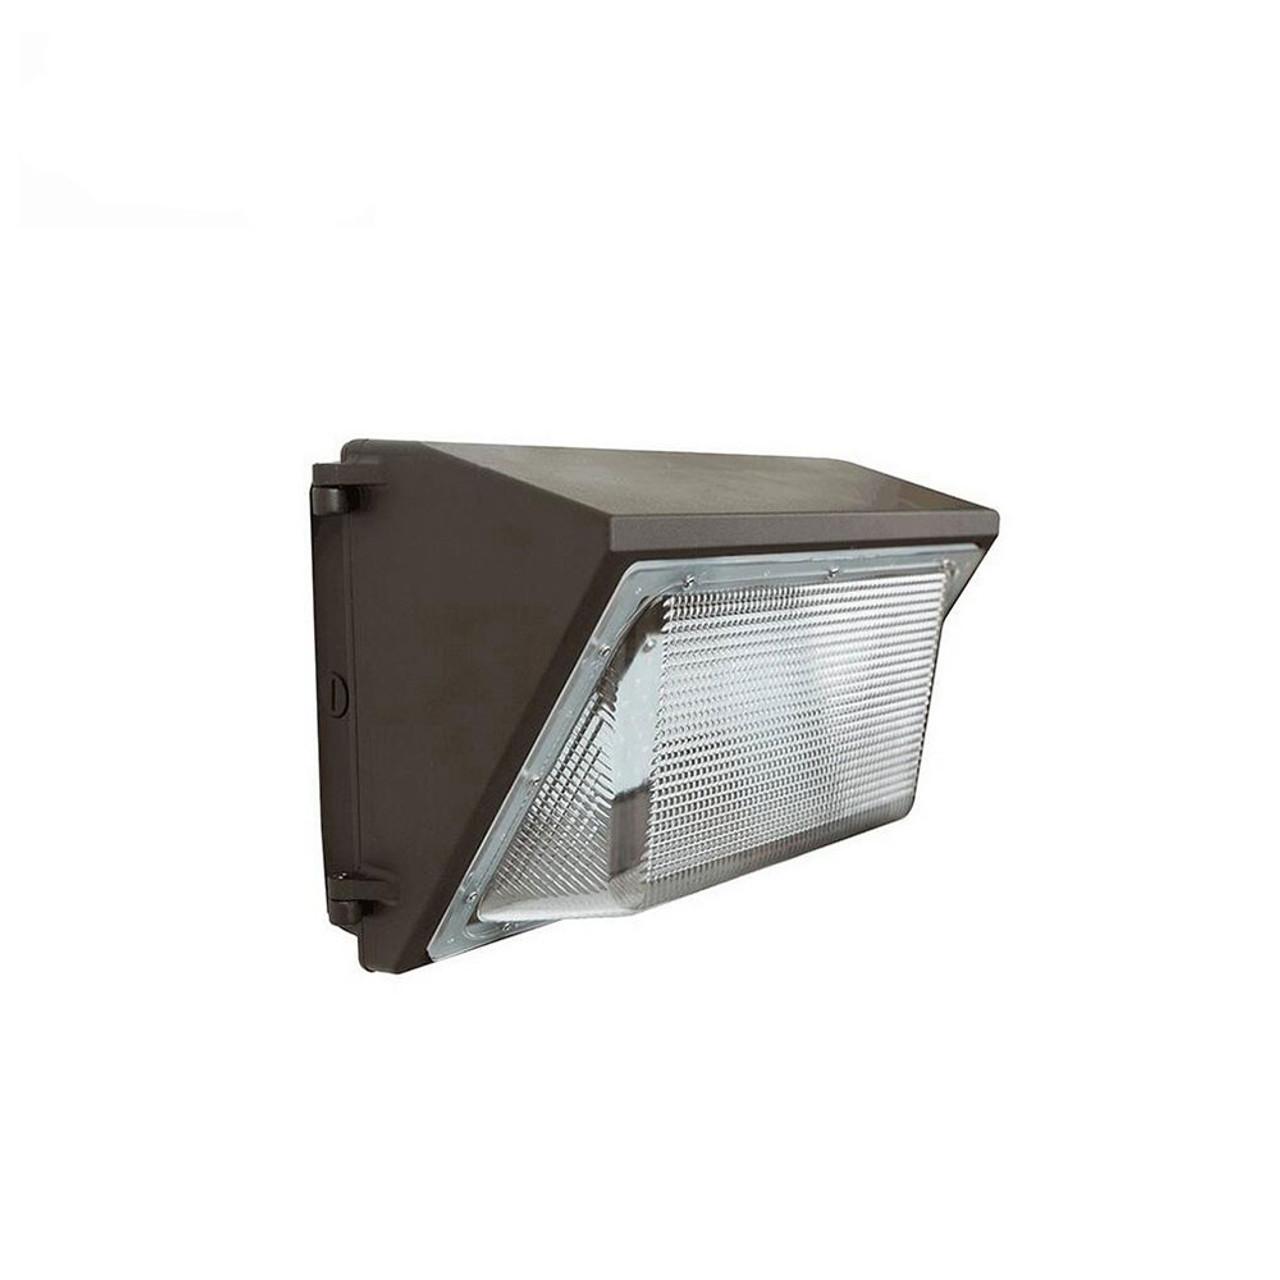 LED Wall Pack, 90 Watt, 10500 lumen, 5000 Kelvin, 347-480 volt, UL and DLC Listed